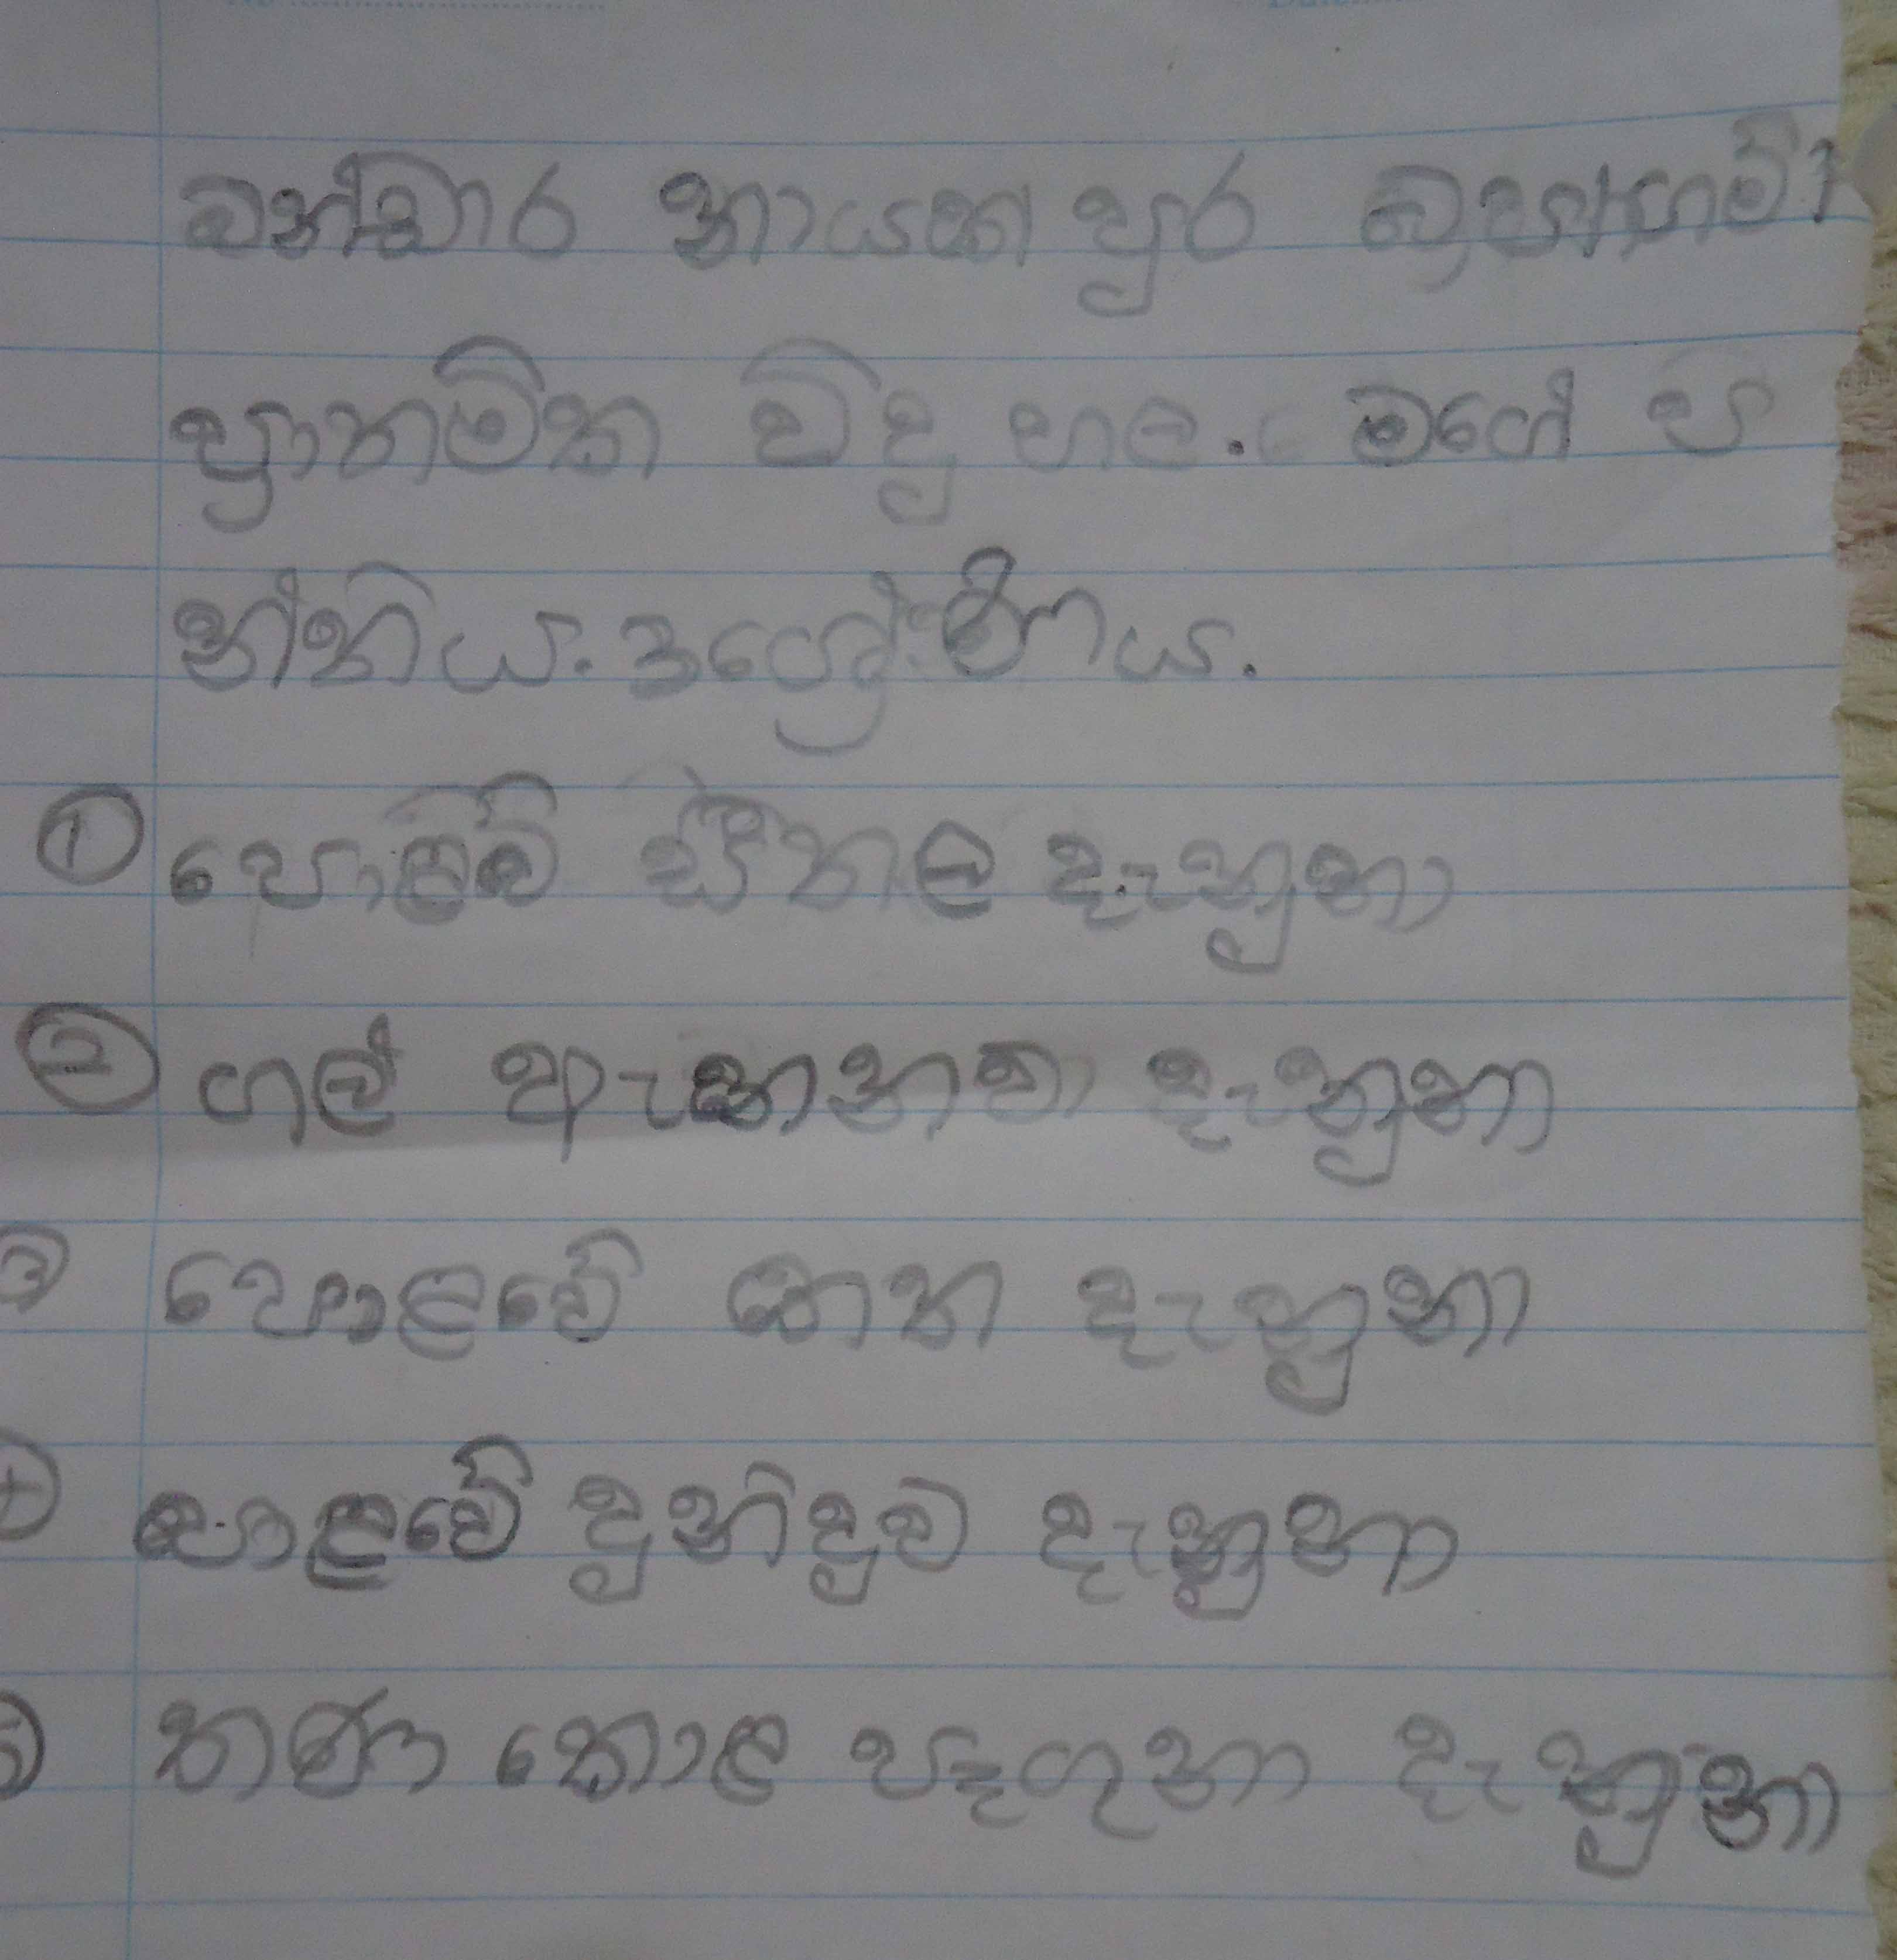 Feedback from students-WP GM Bandaranayakepura Primary School, Kirindiwela (4)